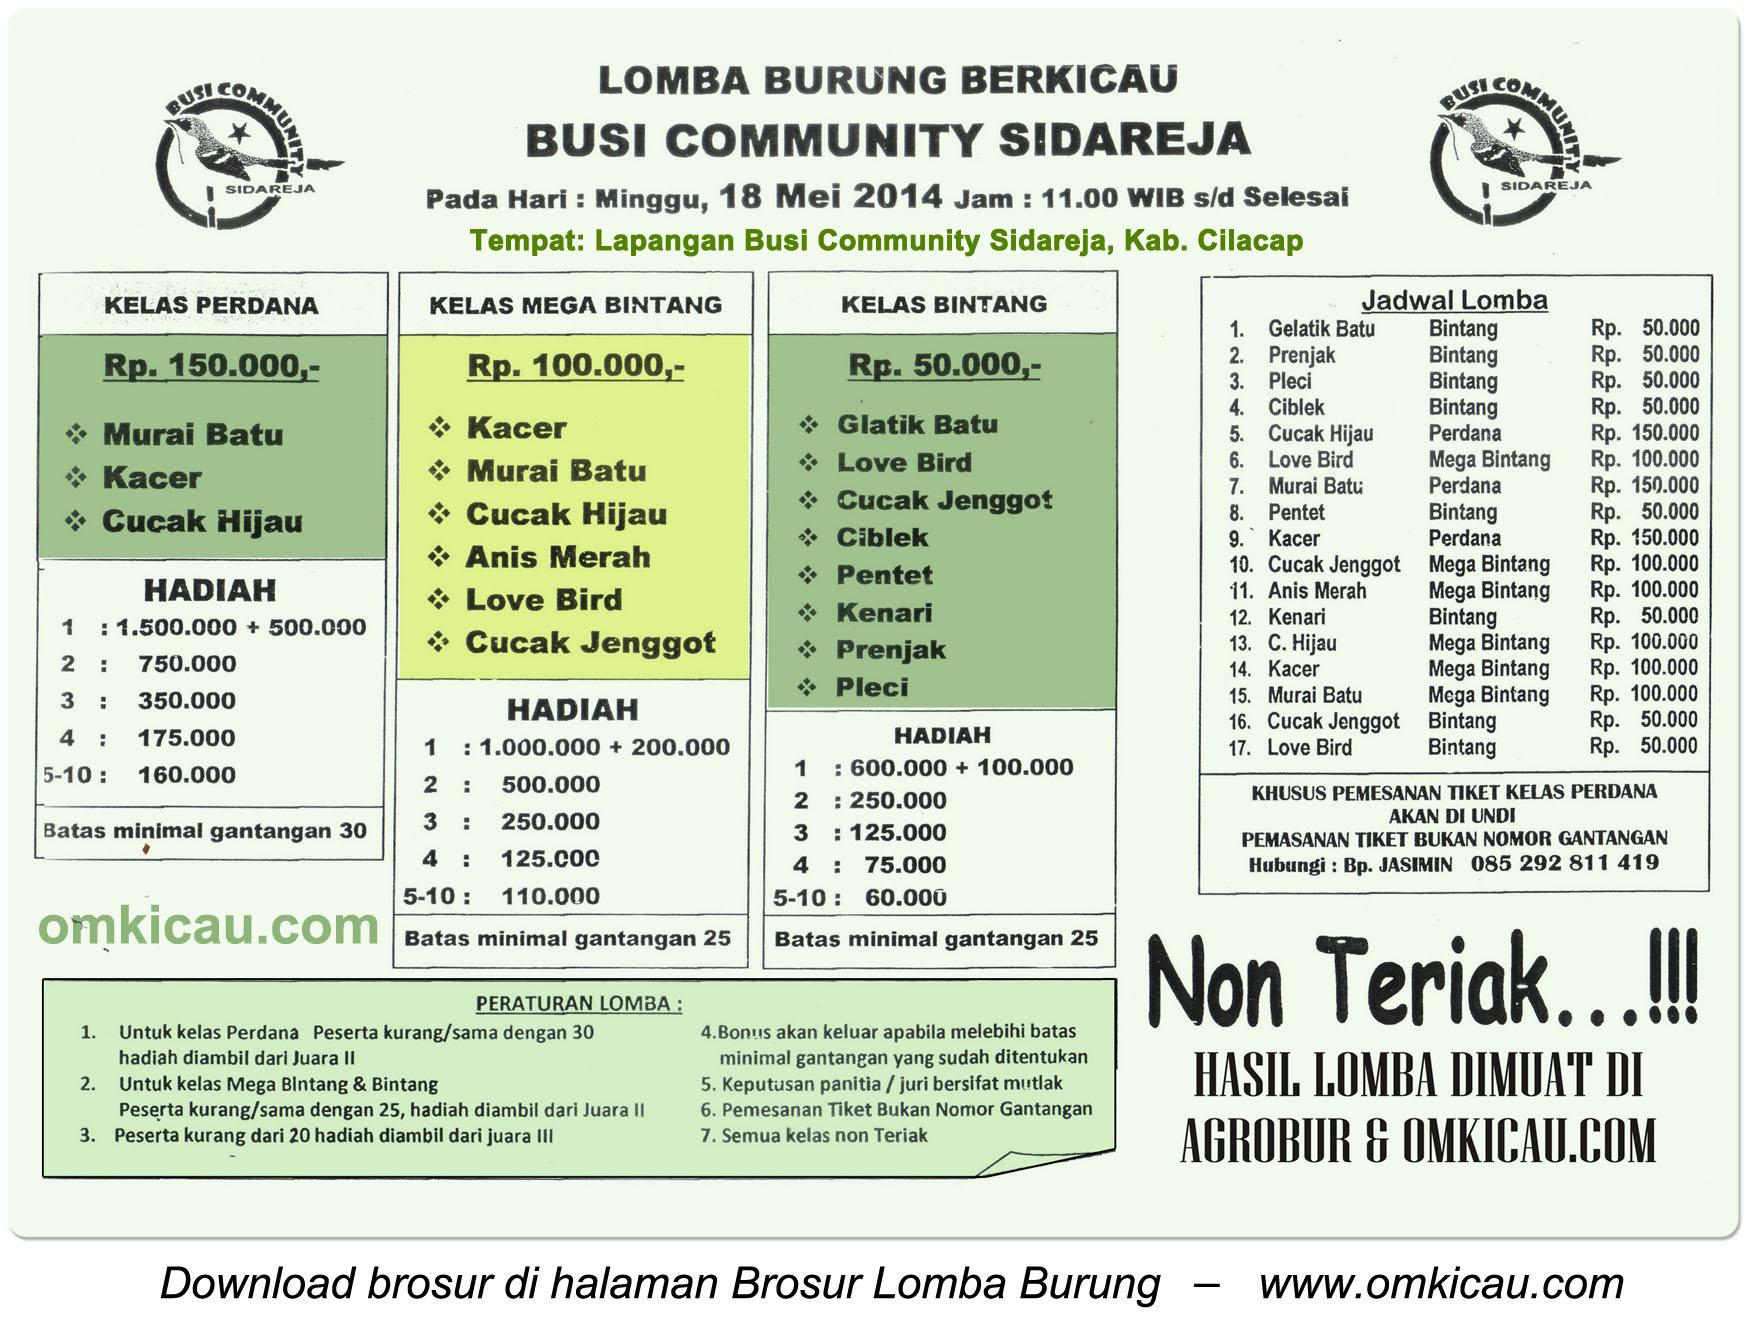 Brosur Lomba Burung Berkicau Busi Community Sidareja, Cilacap, 18 Mei 2014